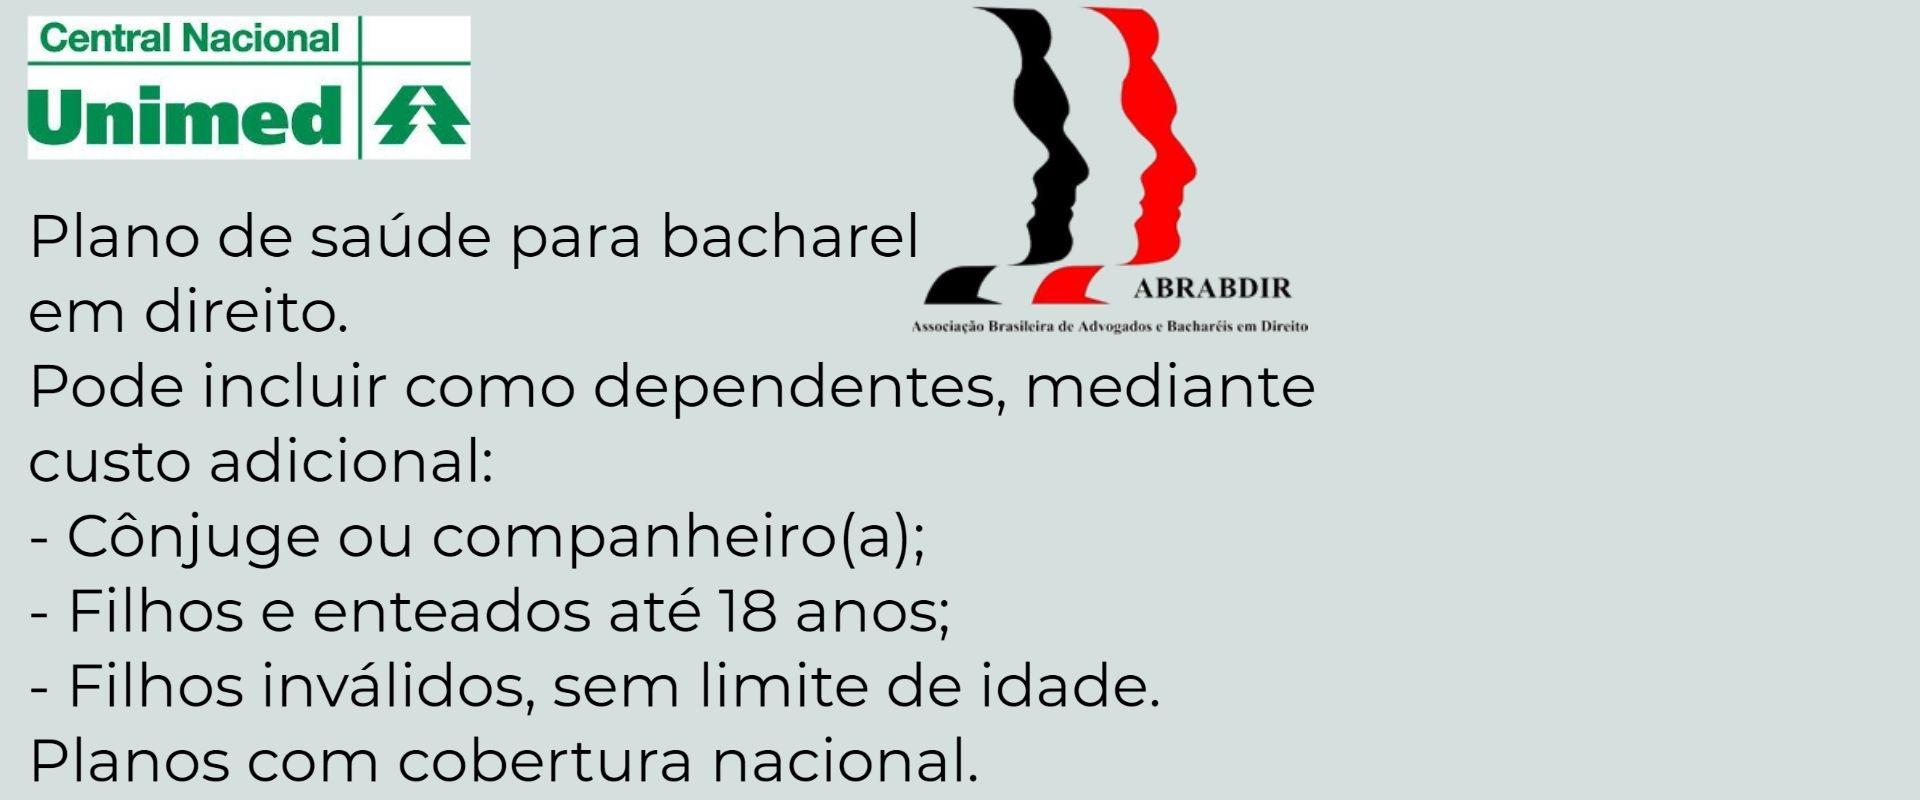 Unimed ABRABDIR Araras